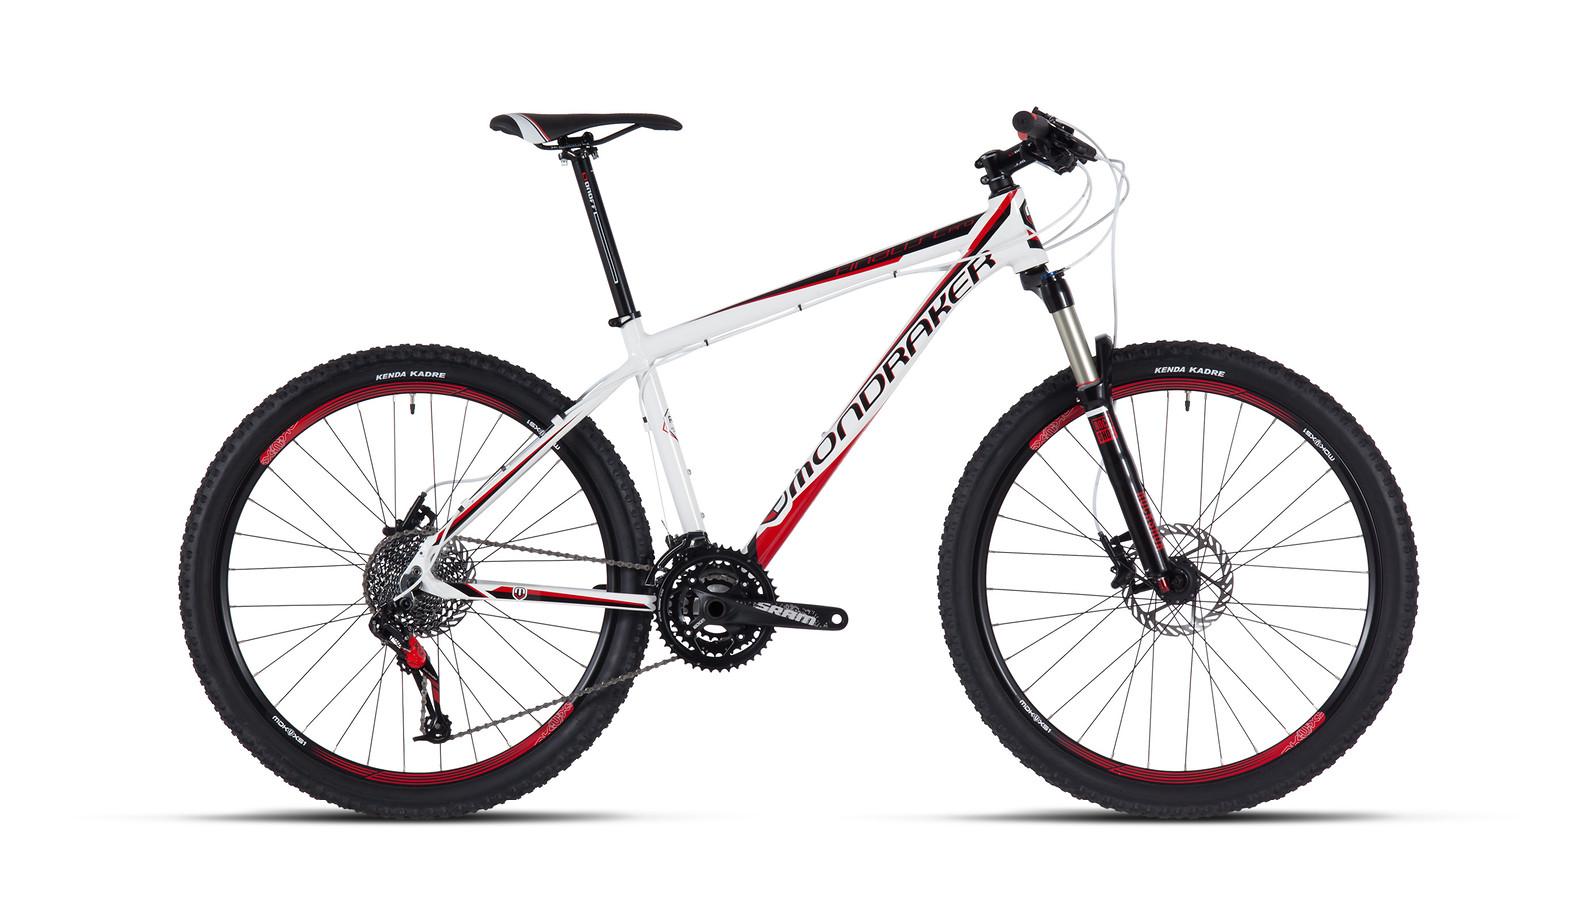 2013 Mondraker Finalist Pro Bike bike - mondraker finalist pro